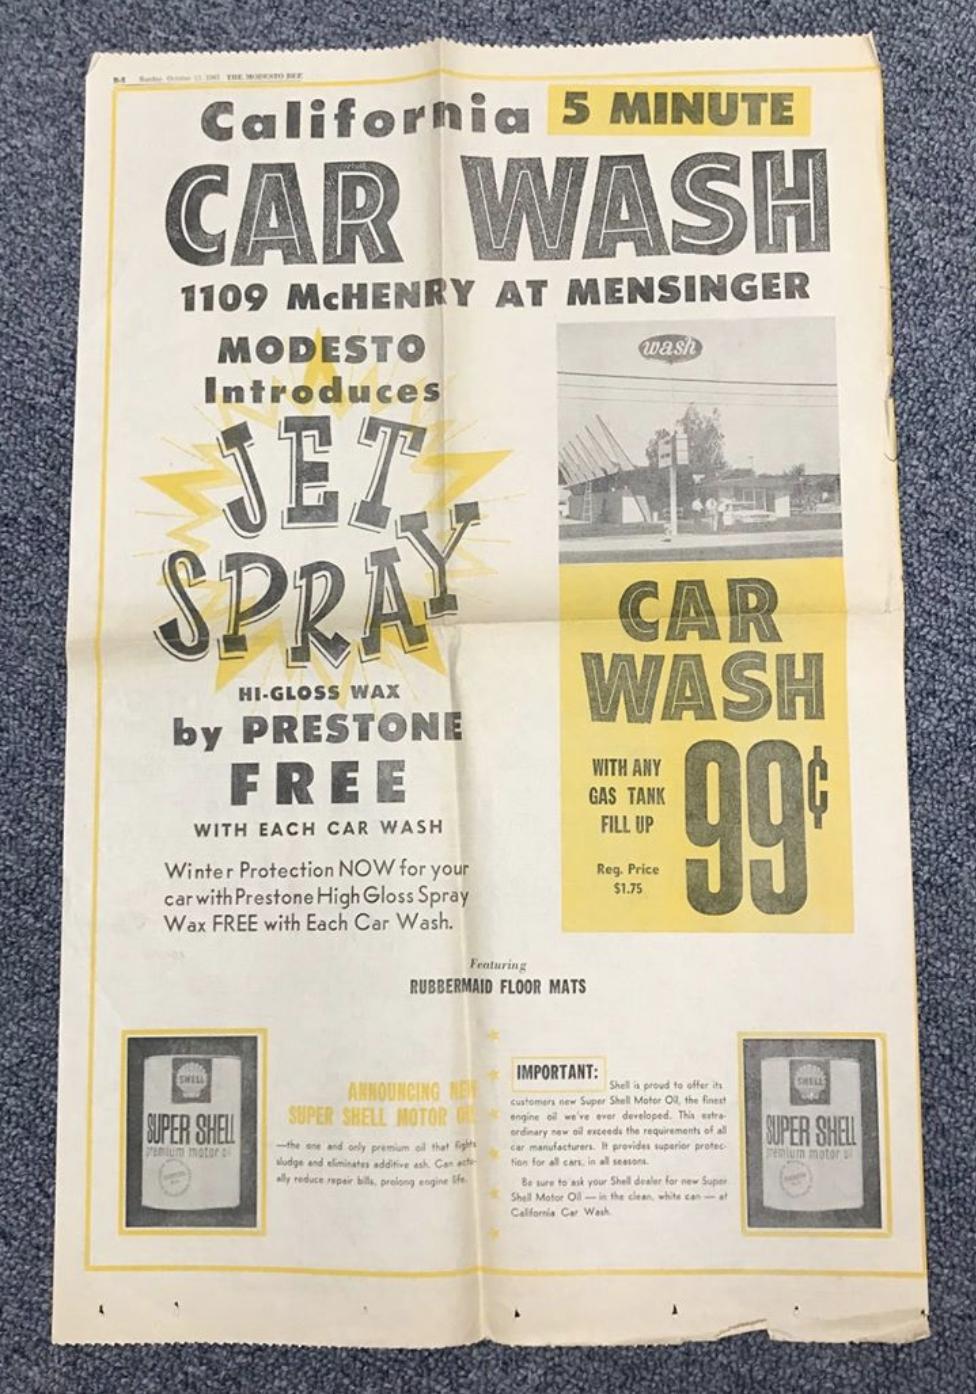 Original 5 Minute CarWash newspaper ad in the Modesto Bee, October 1963.